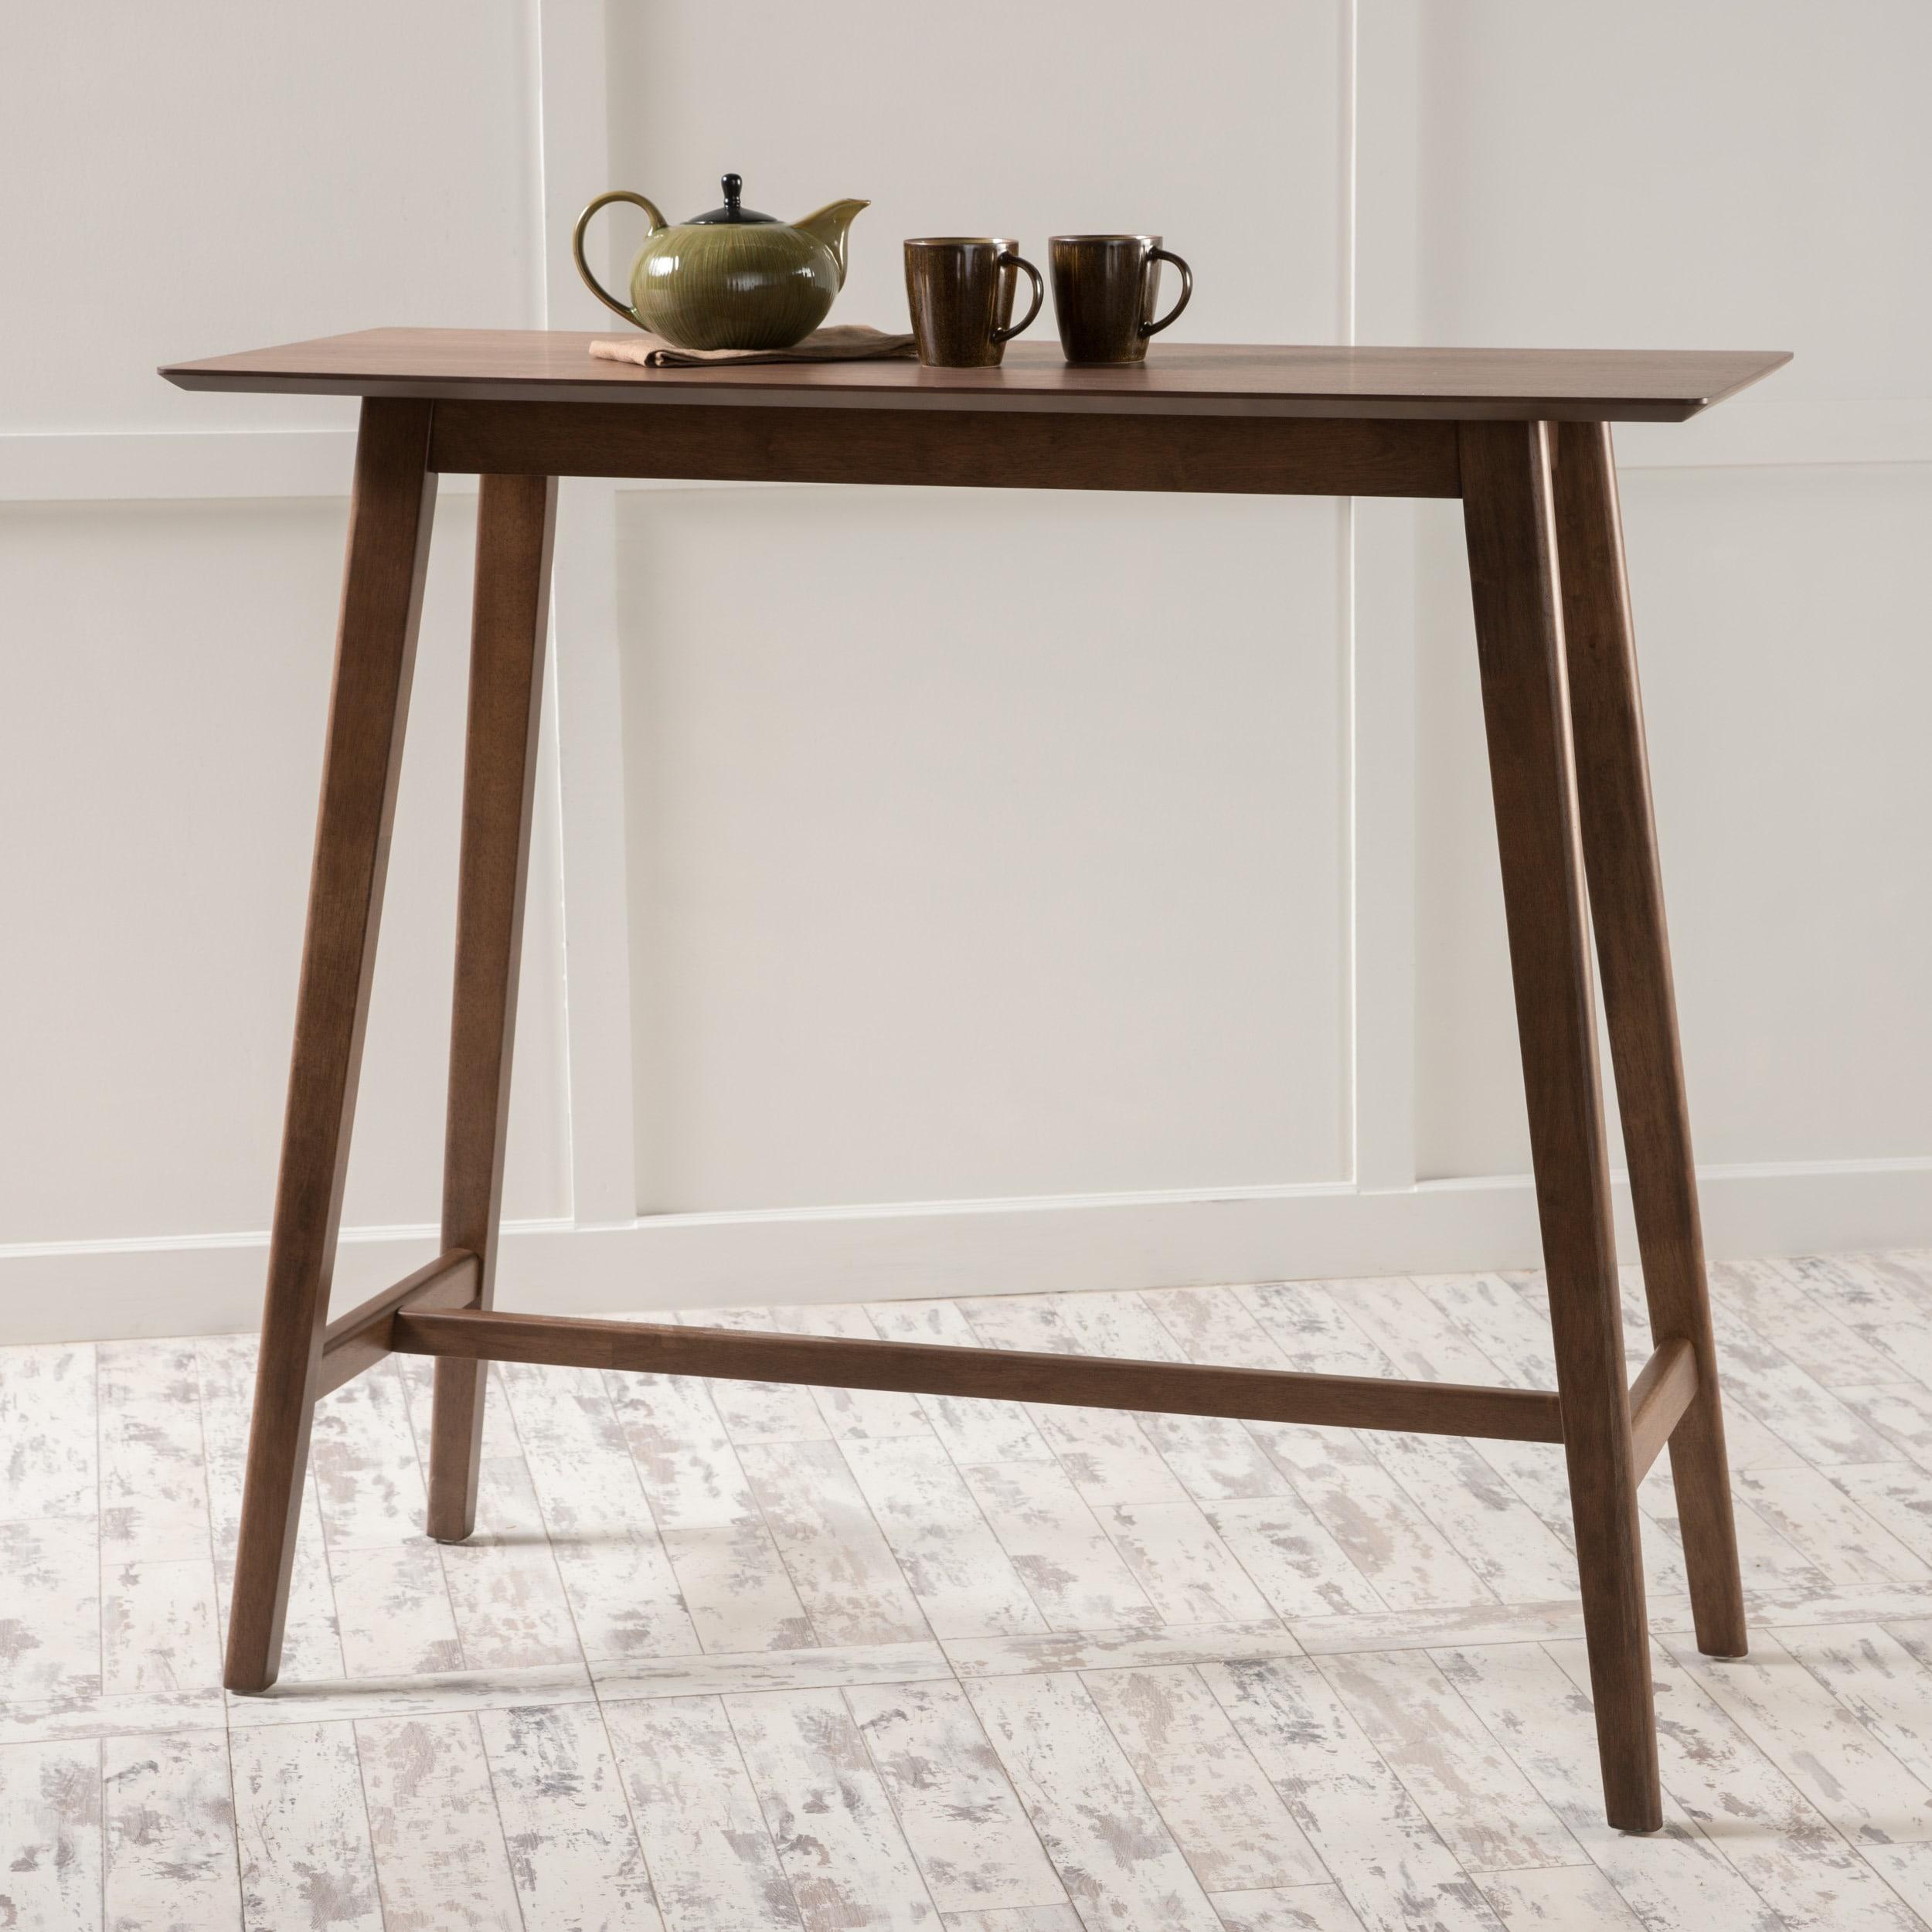 Shop carson carrington viborg walnut finish wood bar table free shipping on orders over 45 overstock com 12882165